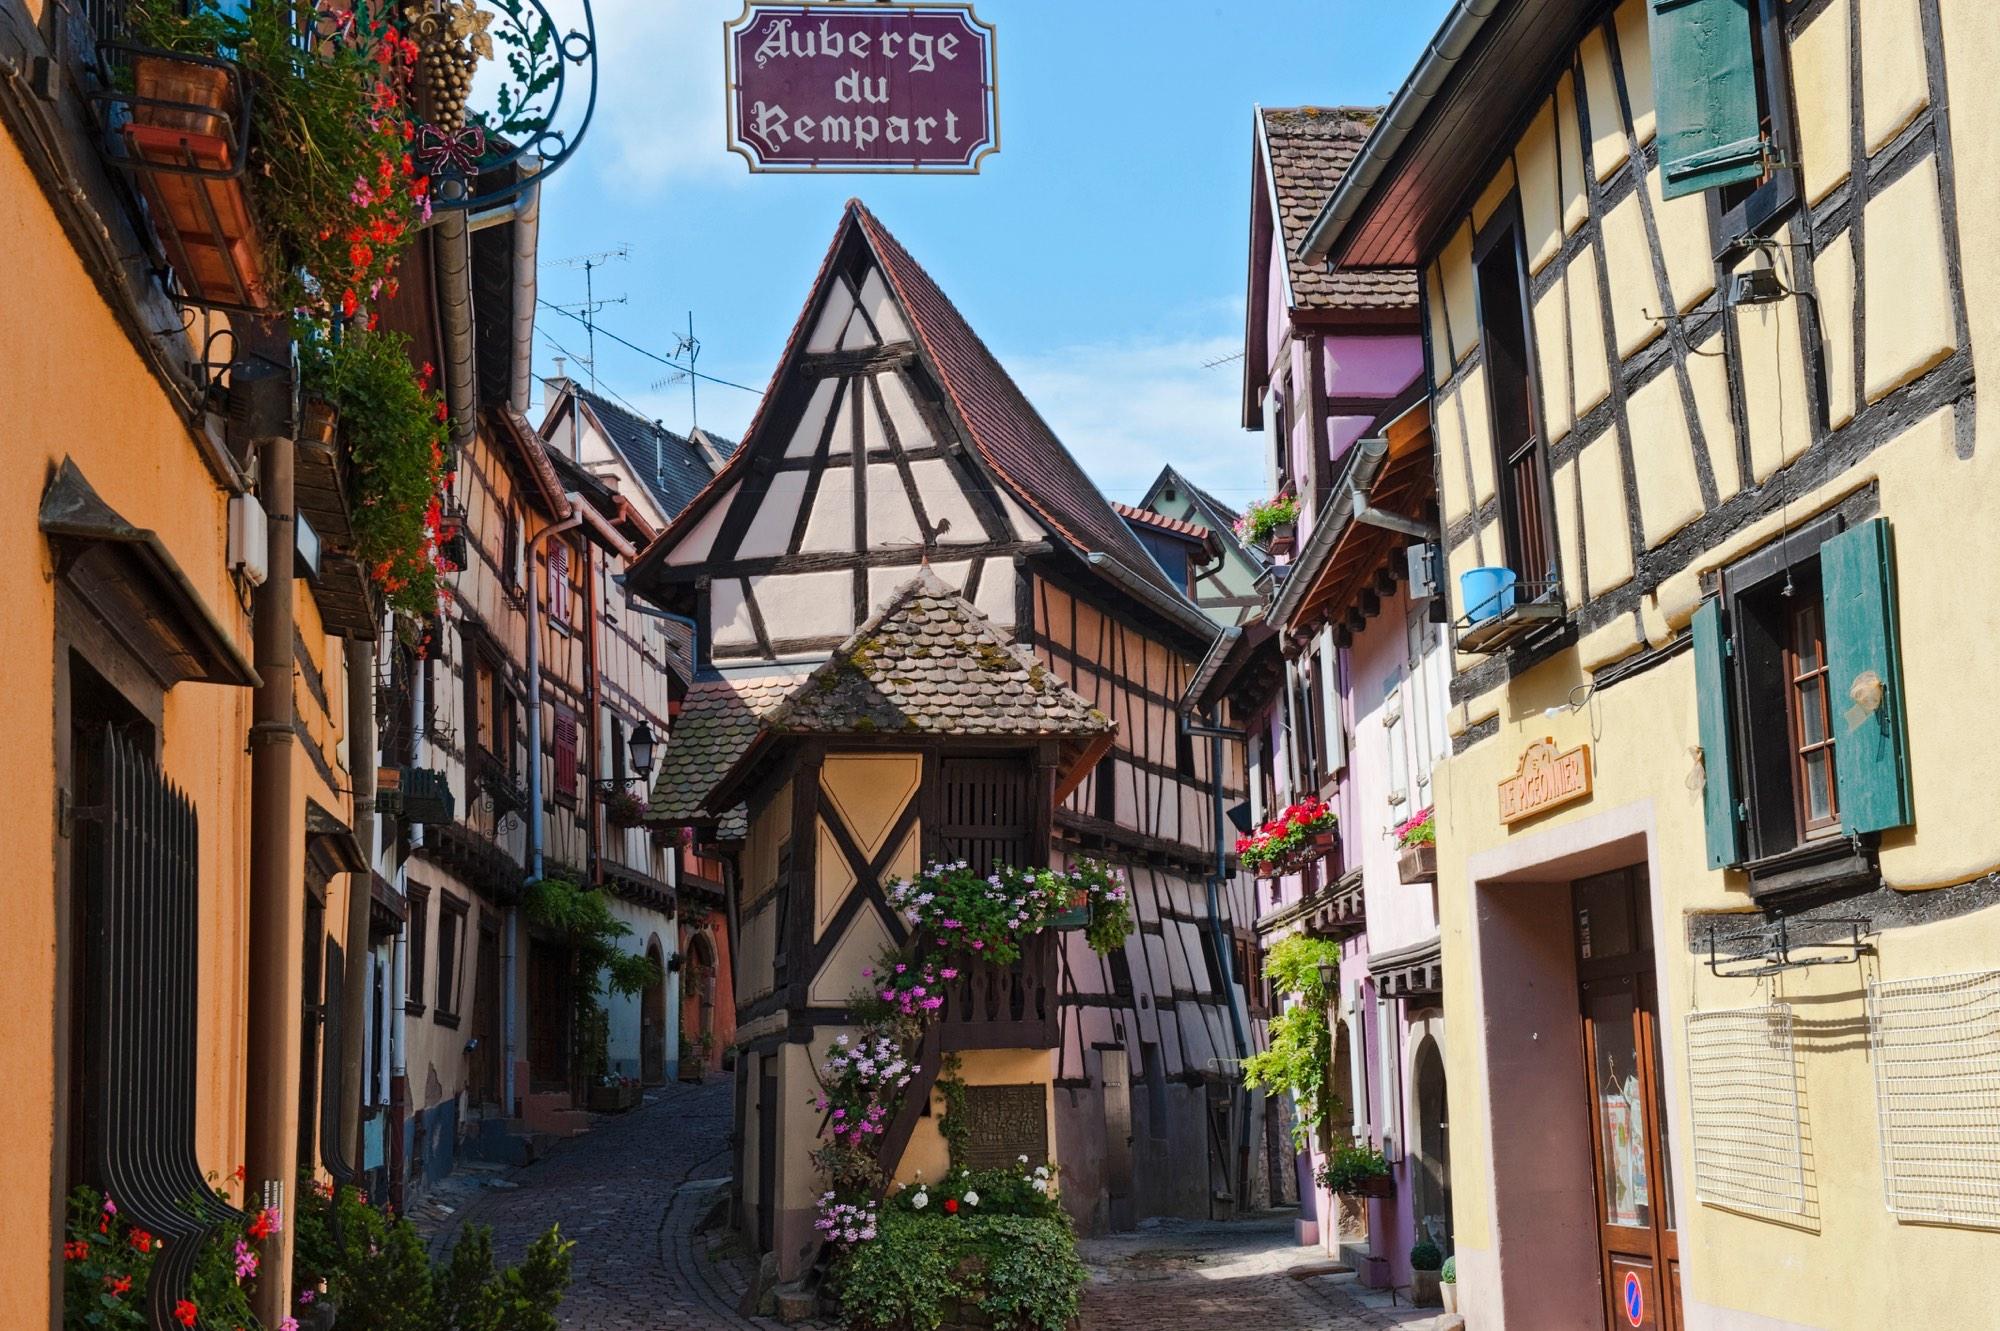 Office de tourisme d 39 eguisheim - Office de tourisme eguisheim ...